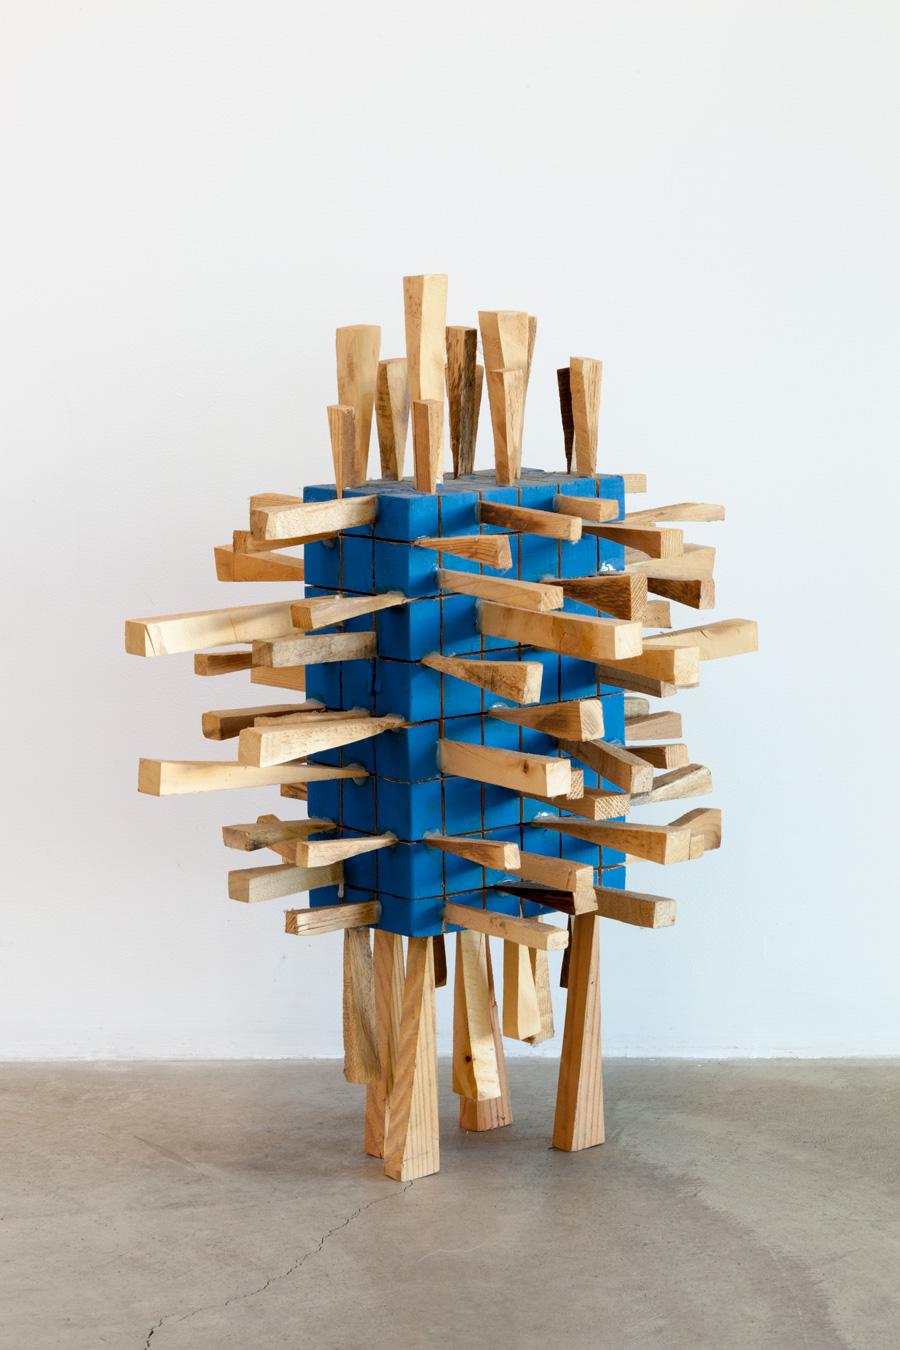 Gathered Circumstances , 2005  集様 ( Shūyō ) Wood, acrylic 22 x 14 15/16 x 18 7/8 inches 56 x 38 x 48 centimeters